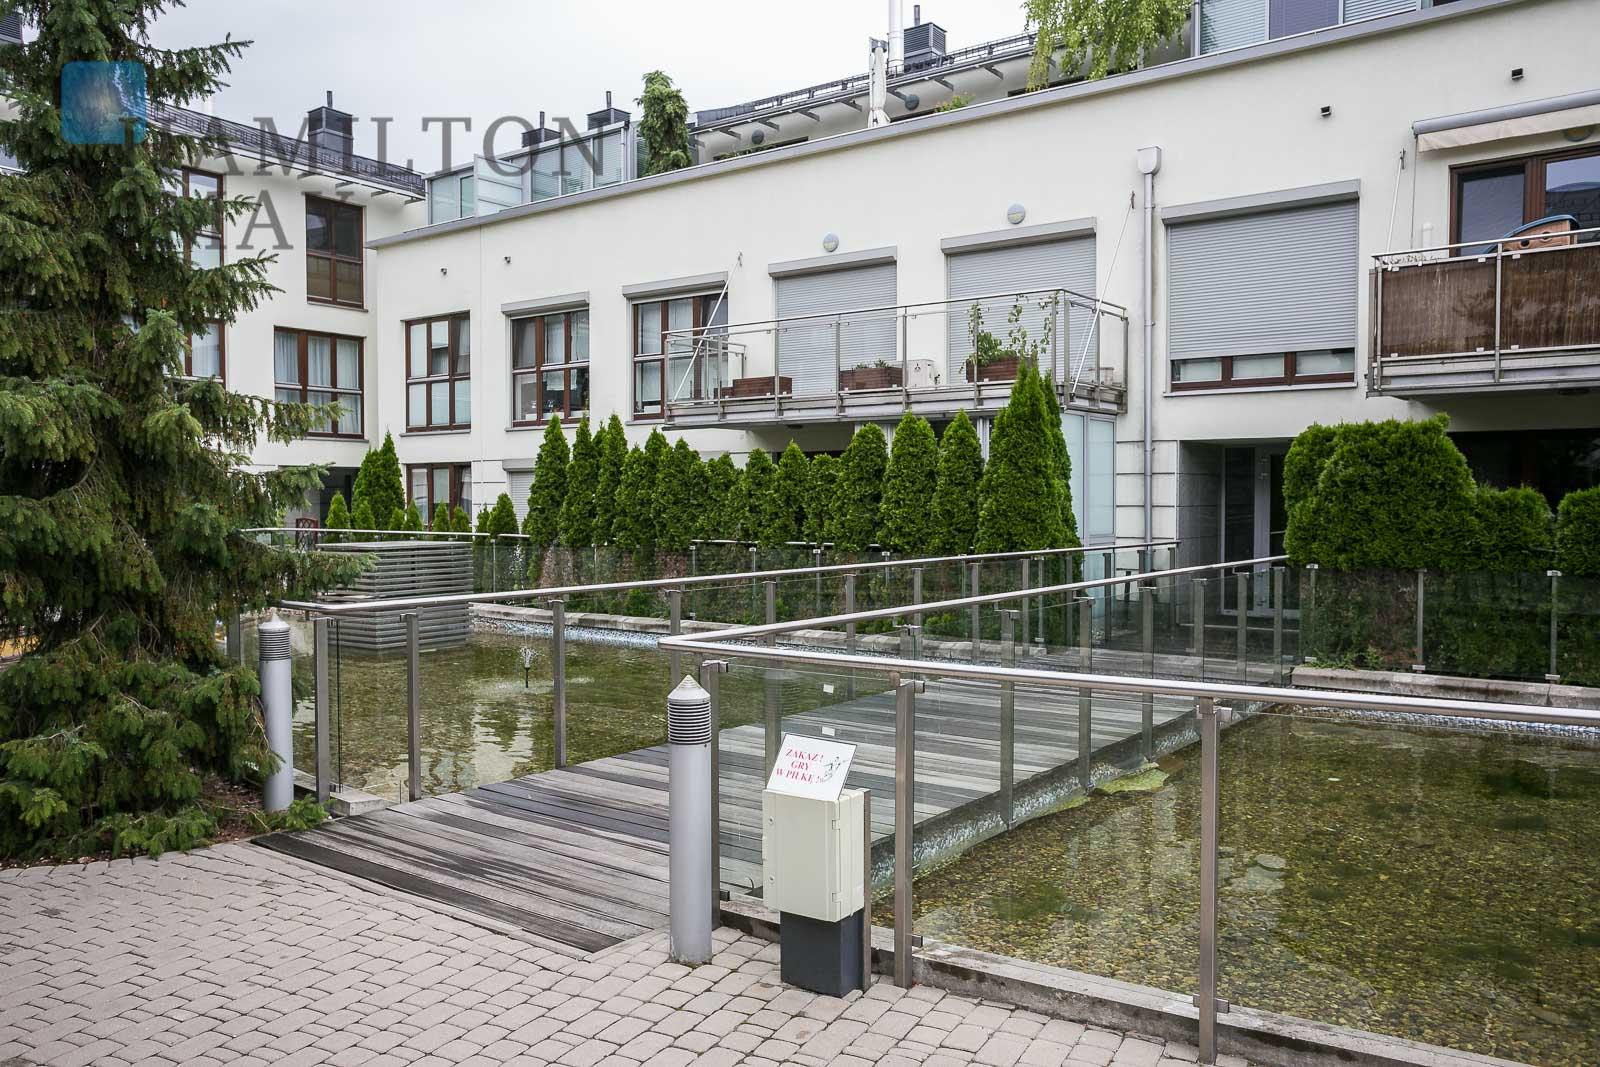 An apartment in the Rezydencja Królewska development Warsaw for rent